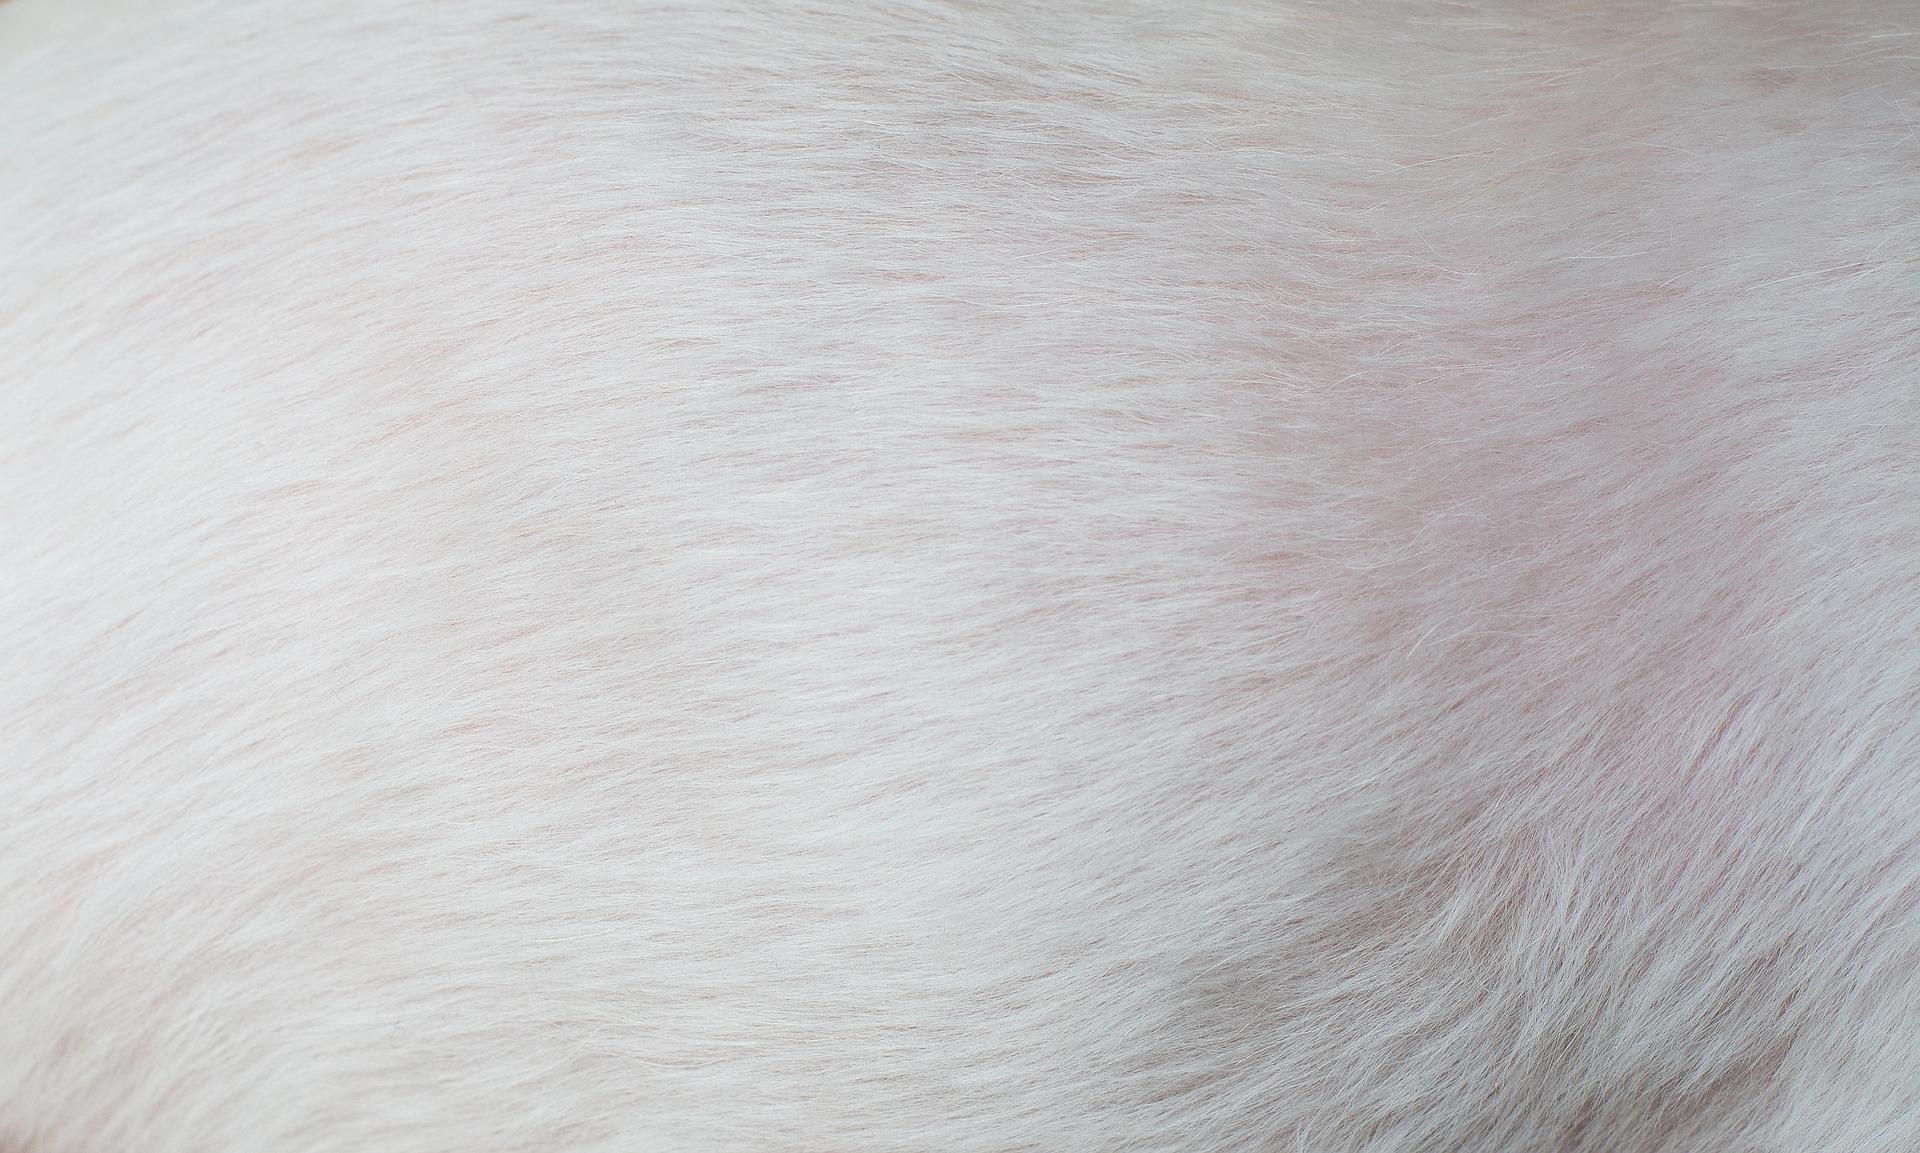 Bild zeigt weiße Hundehaare